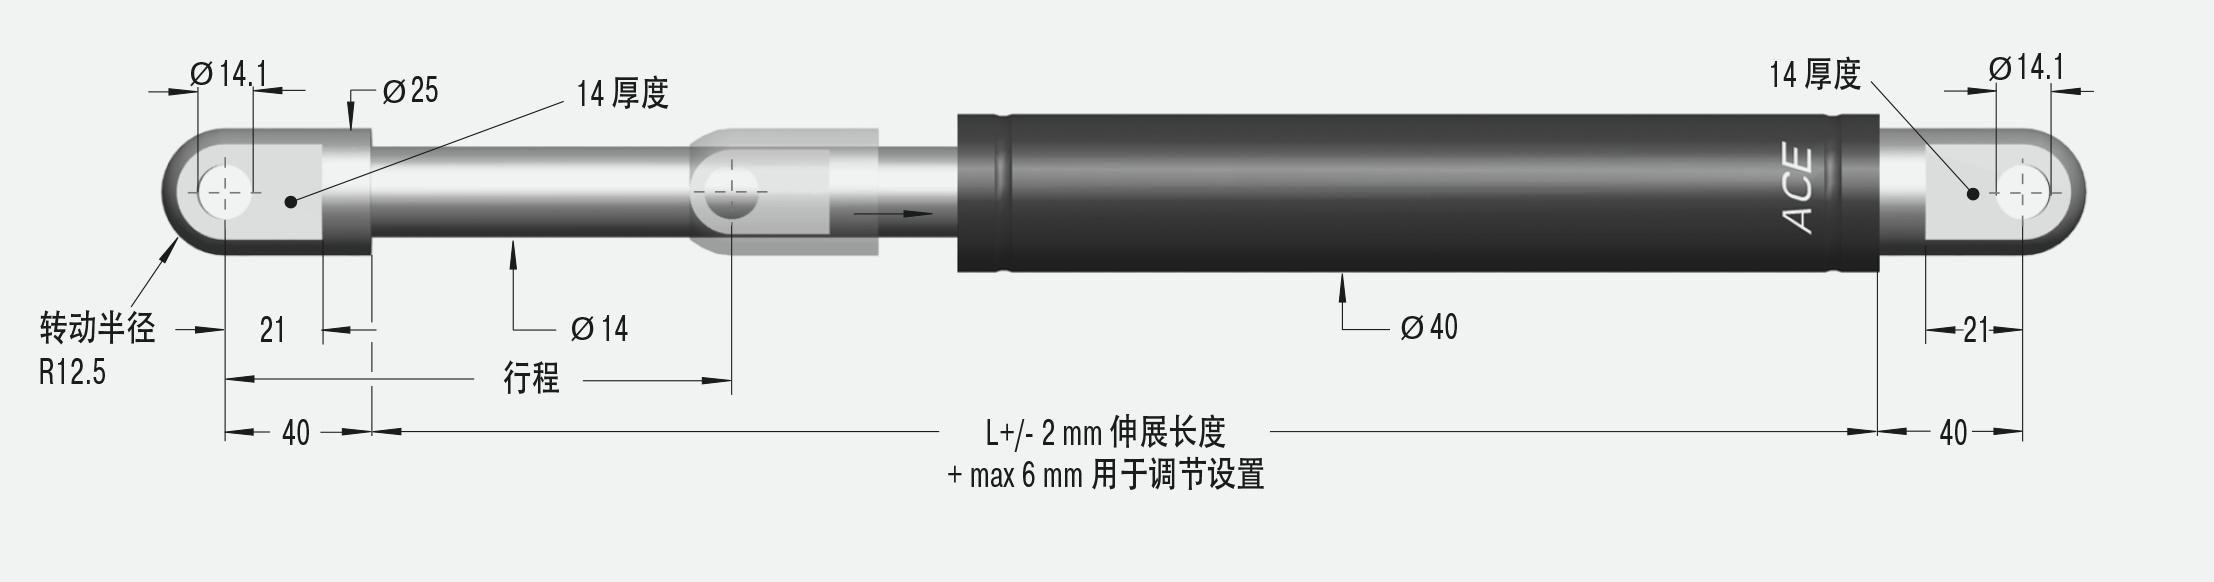 HB-40-200